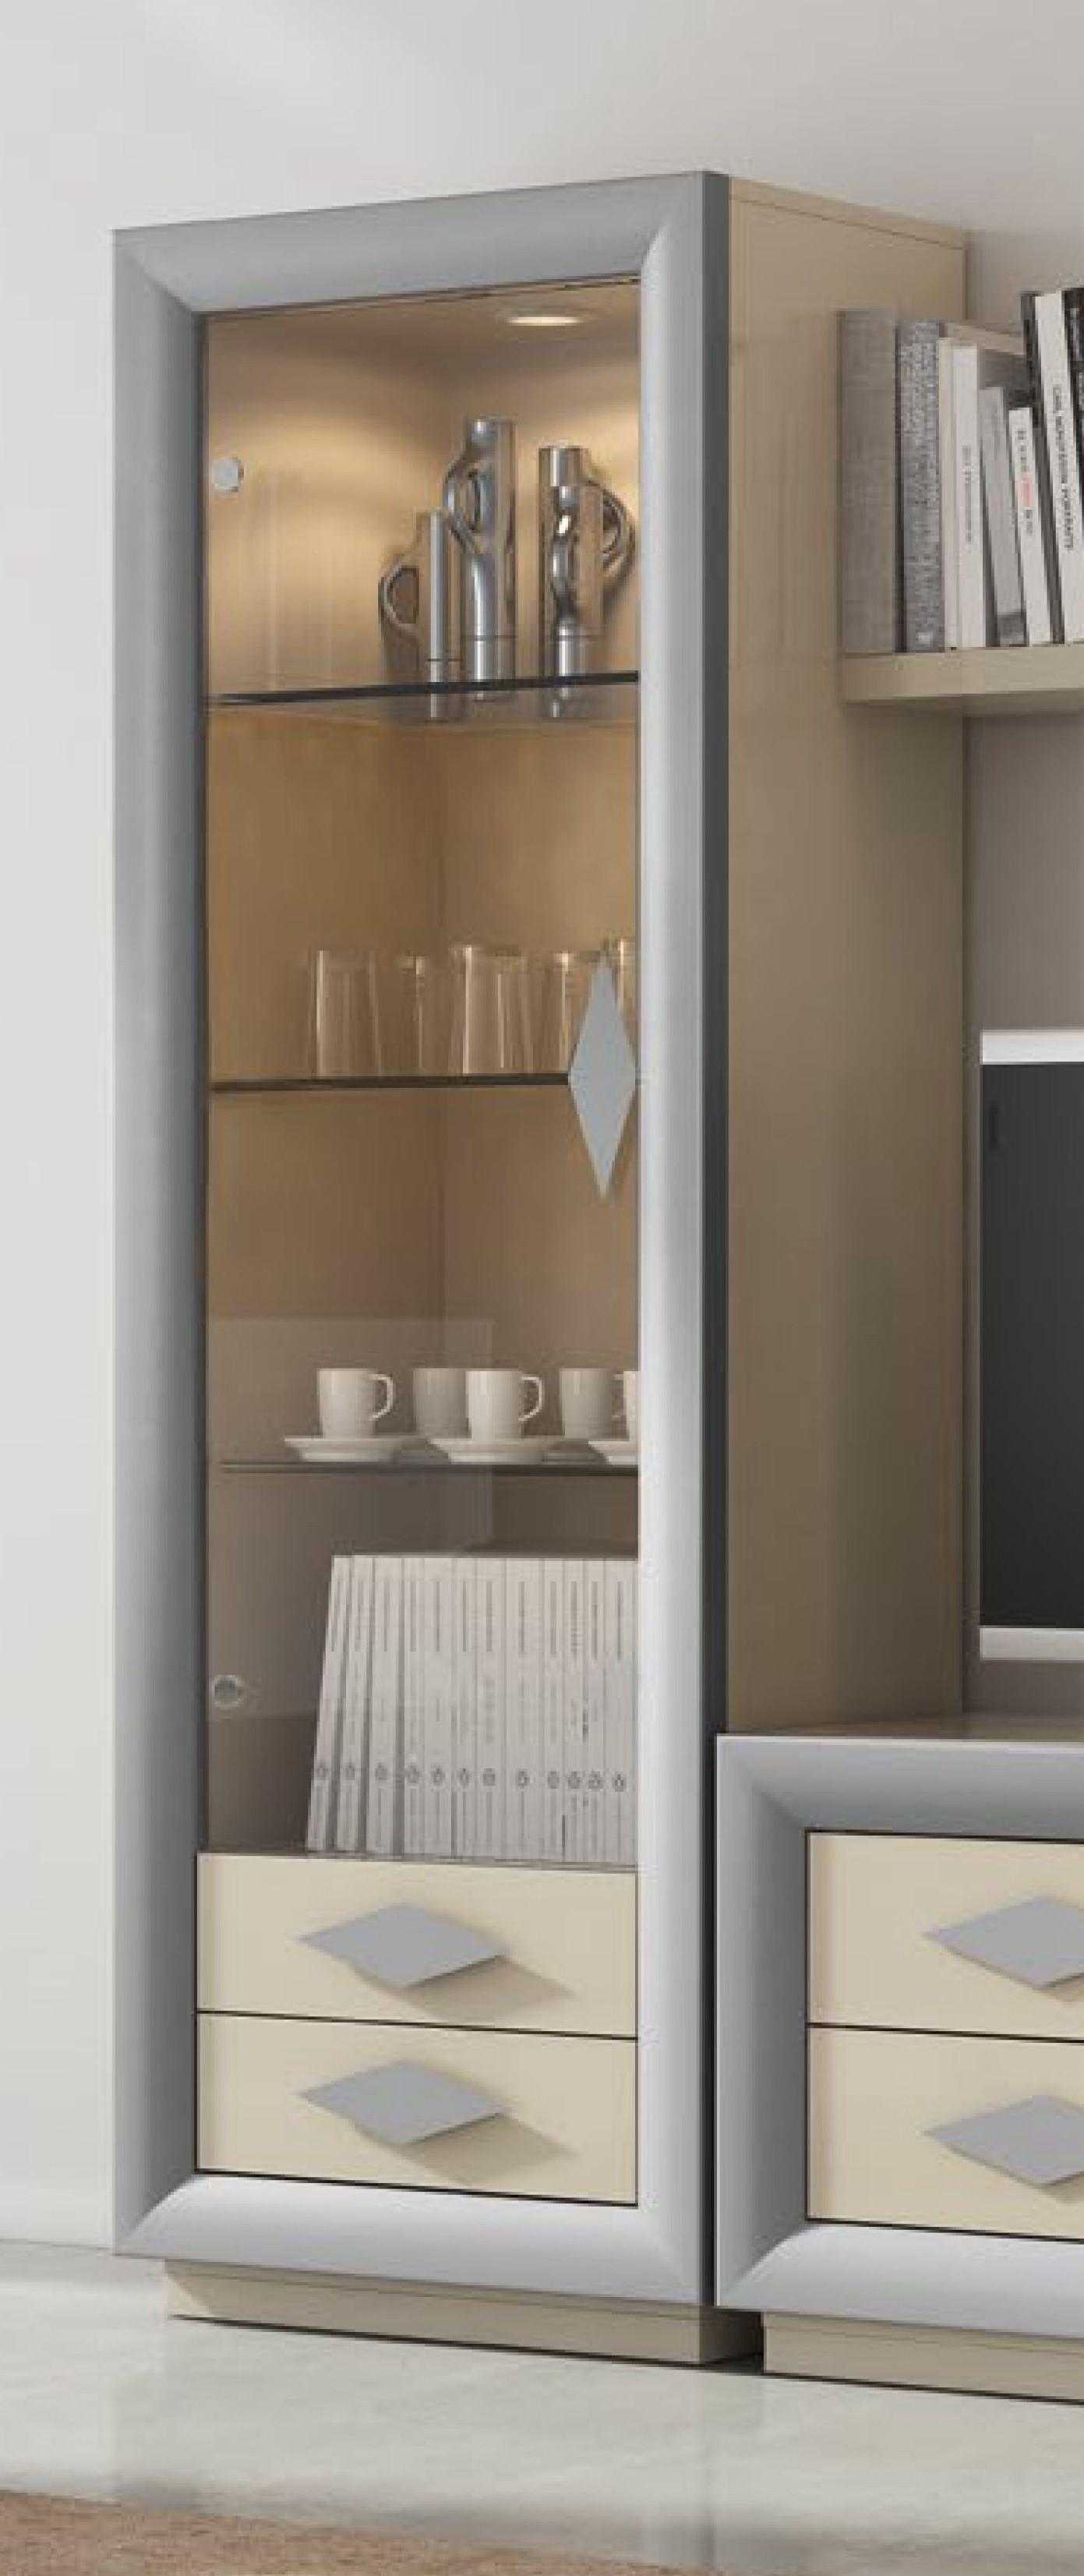 Mueble comedor moderno dise o 162 03 mobles sedav - Mueble comedor diseno ...